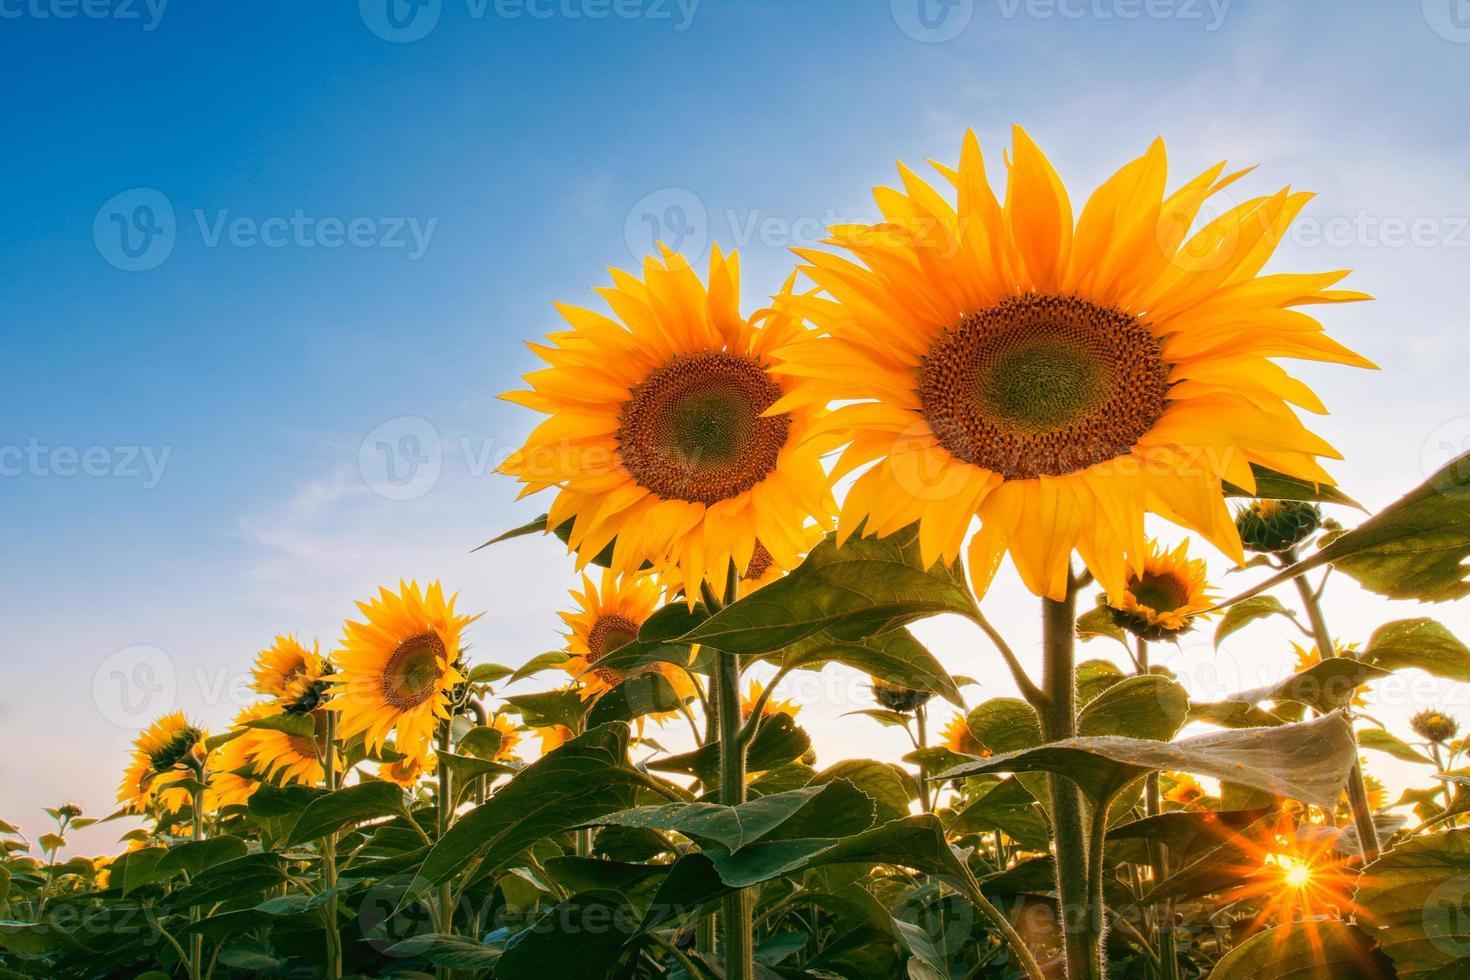 Field of sunflowers under sunset sky photo